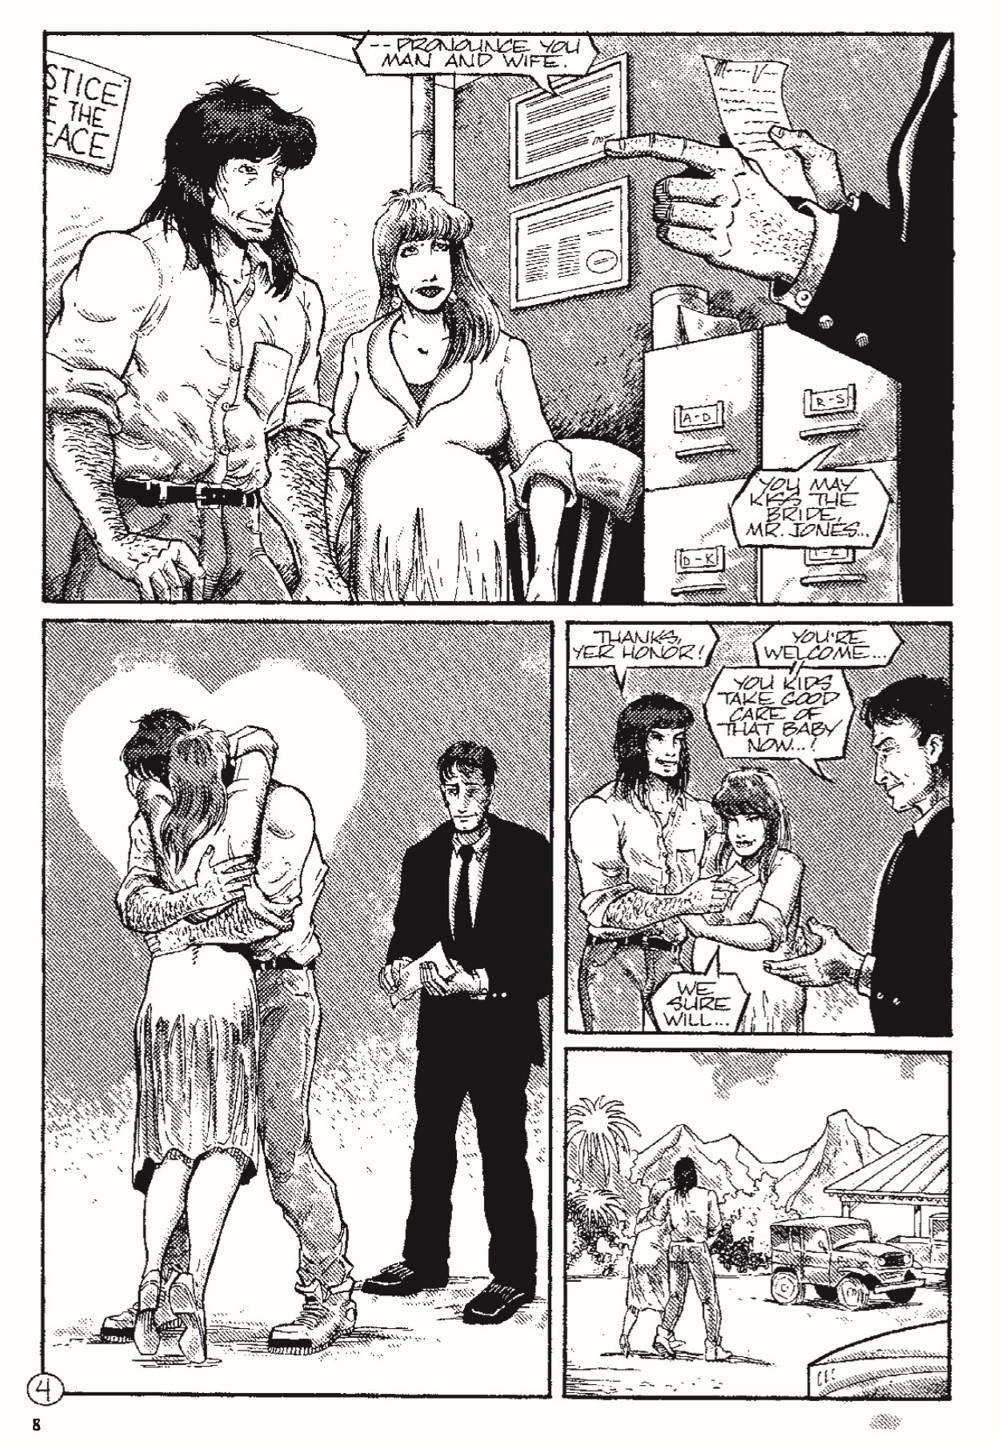 TMNTUltimate_V5_TPB_pr-6 ComicList Previews: TEENAGE MUTANT NINJA TURTLES THE ULTIMATE COLLECTION VOLUME 5 TP